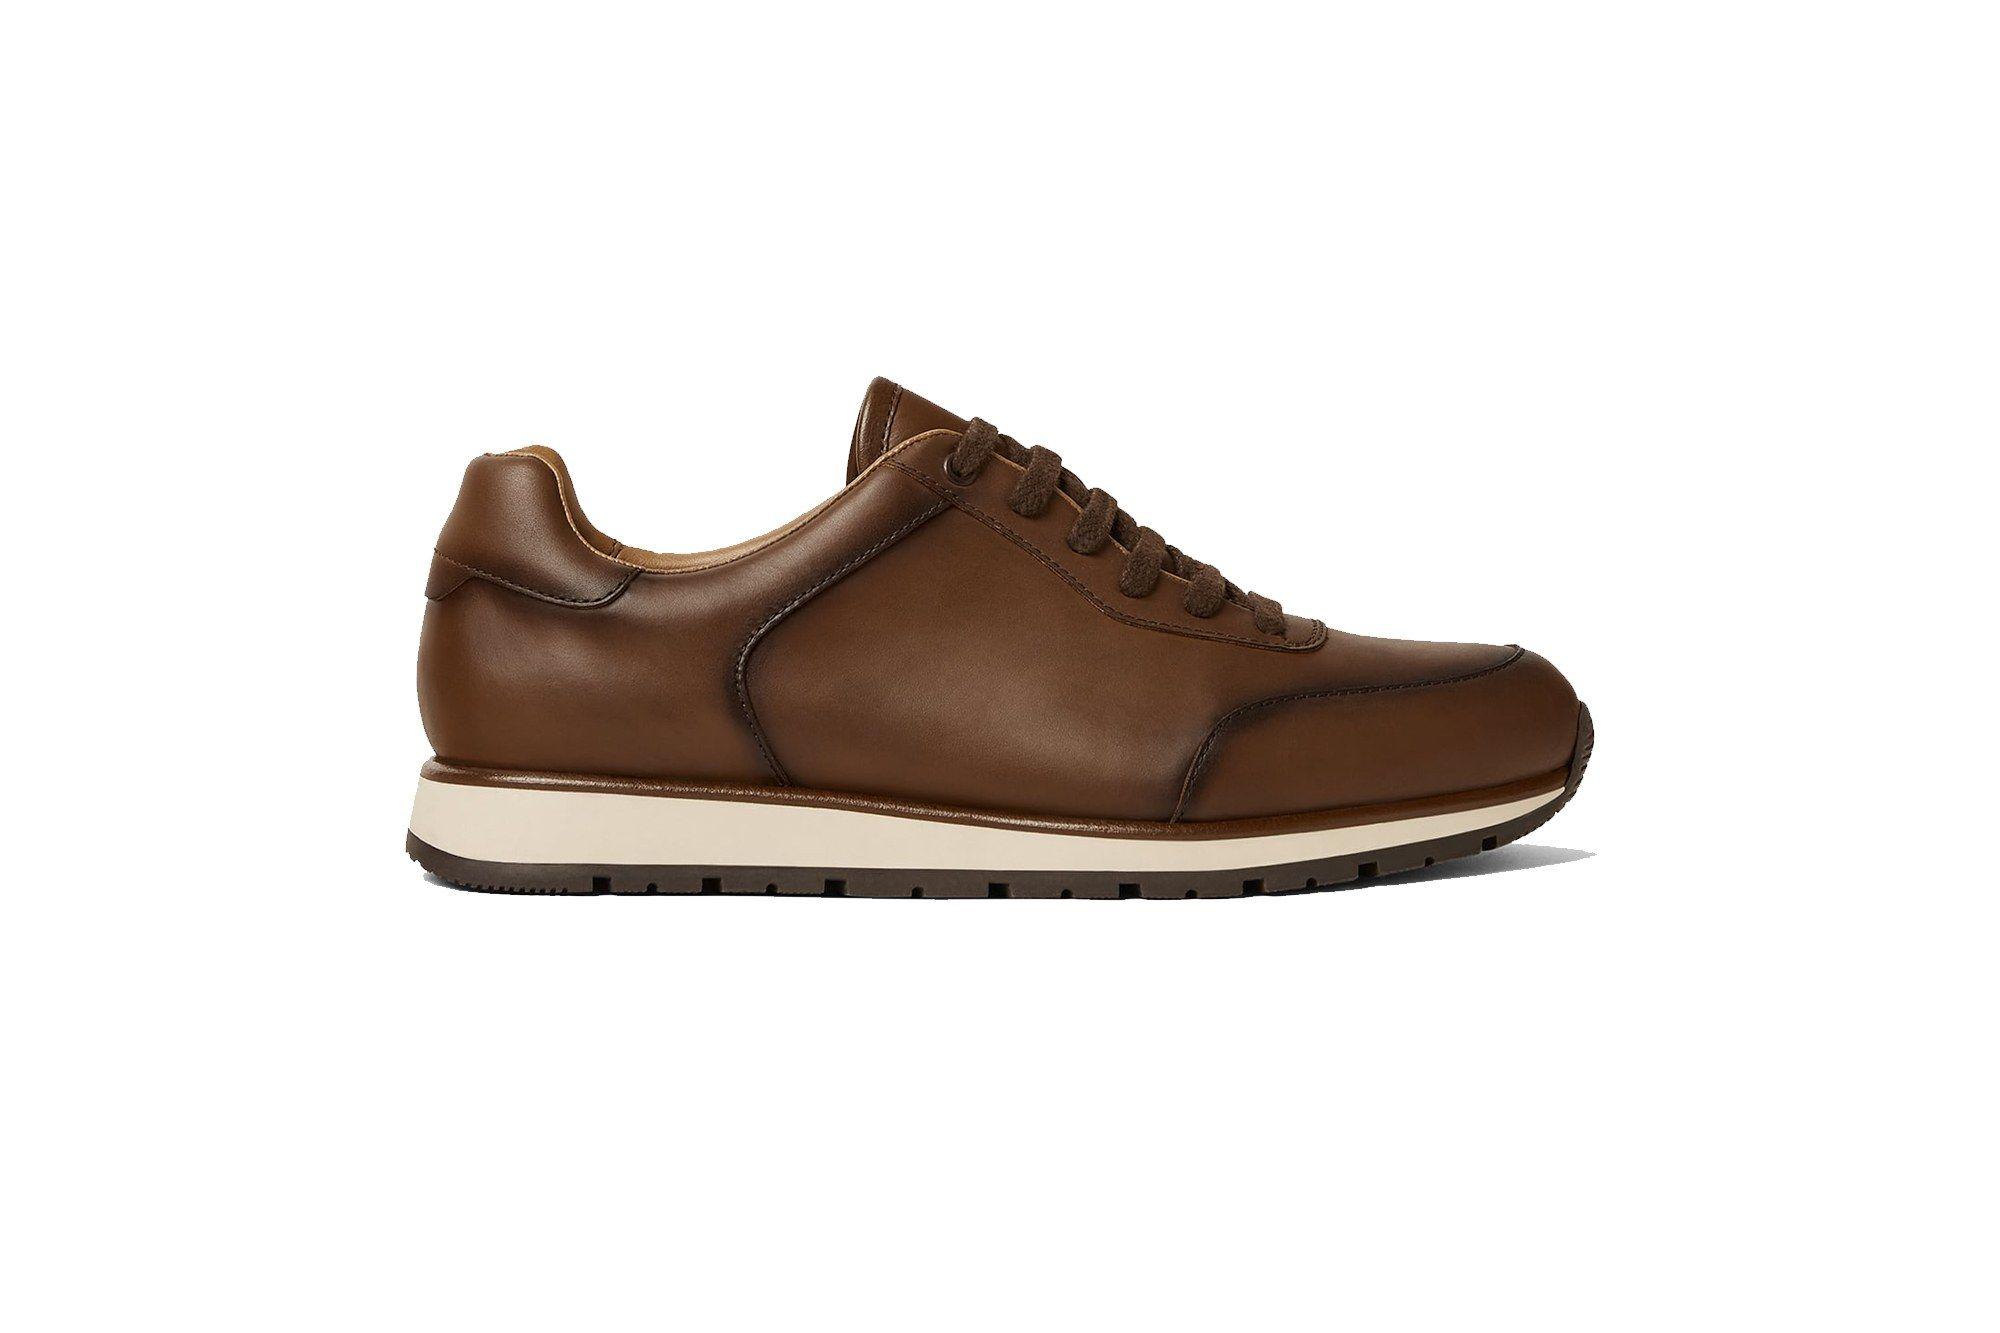 6067f965d3 The Office-Friendly Way to Wear Slip-On Sneakers